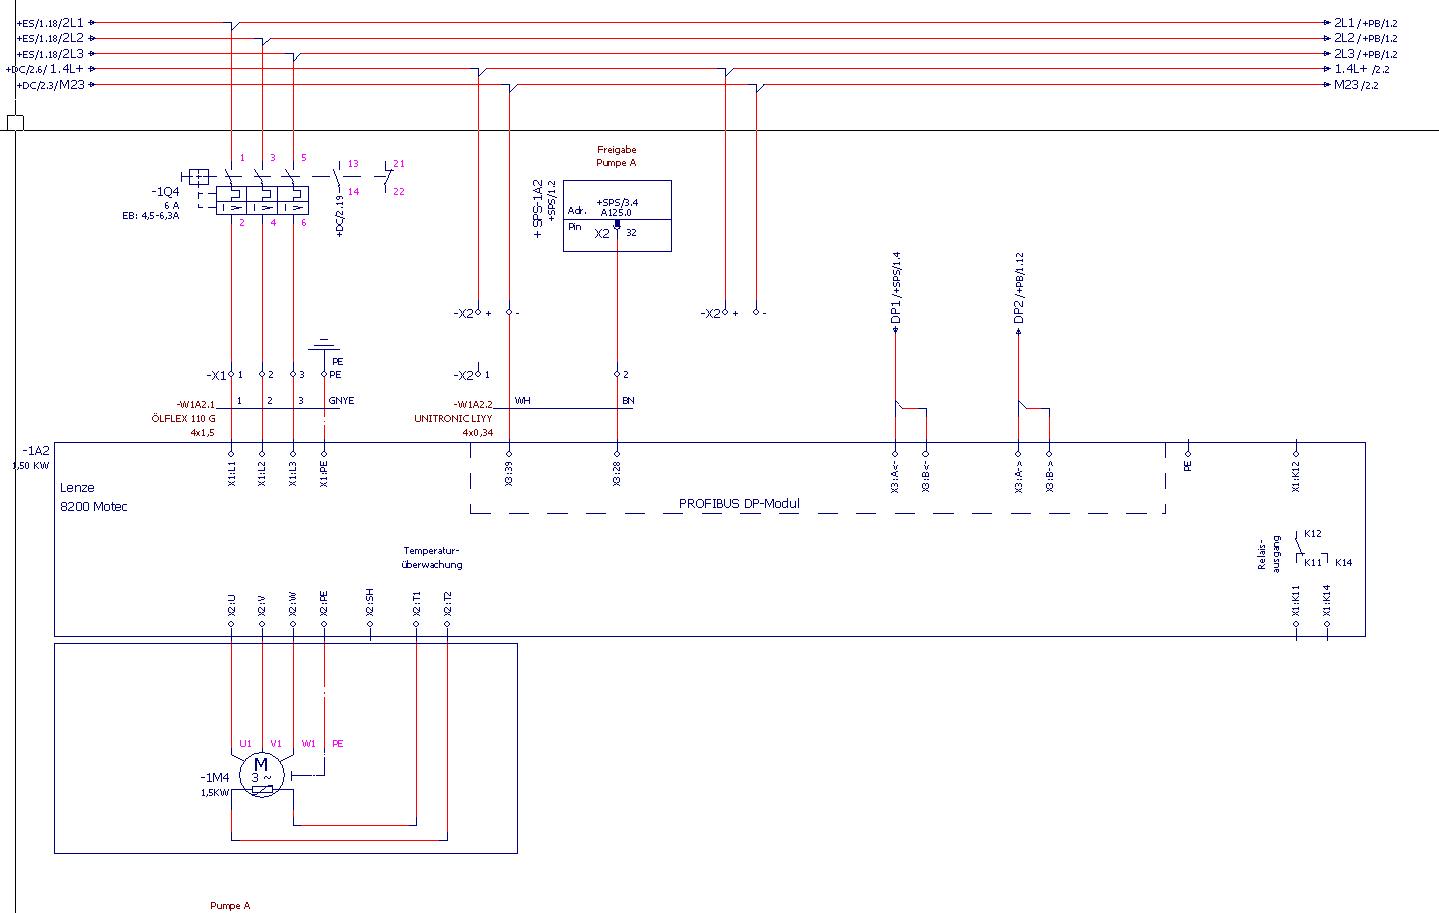 SPS Makros im Eplan (Elektrotechnik/EPLAN5) - Foren auf CAD.de